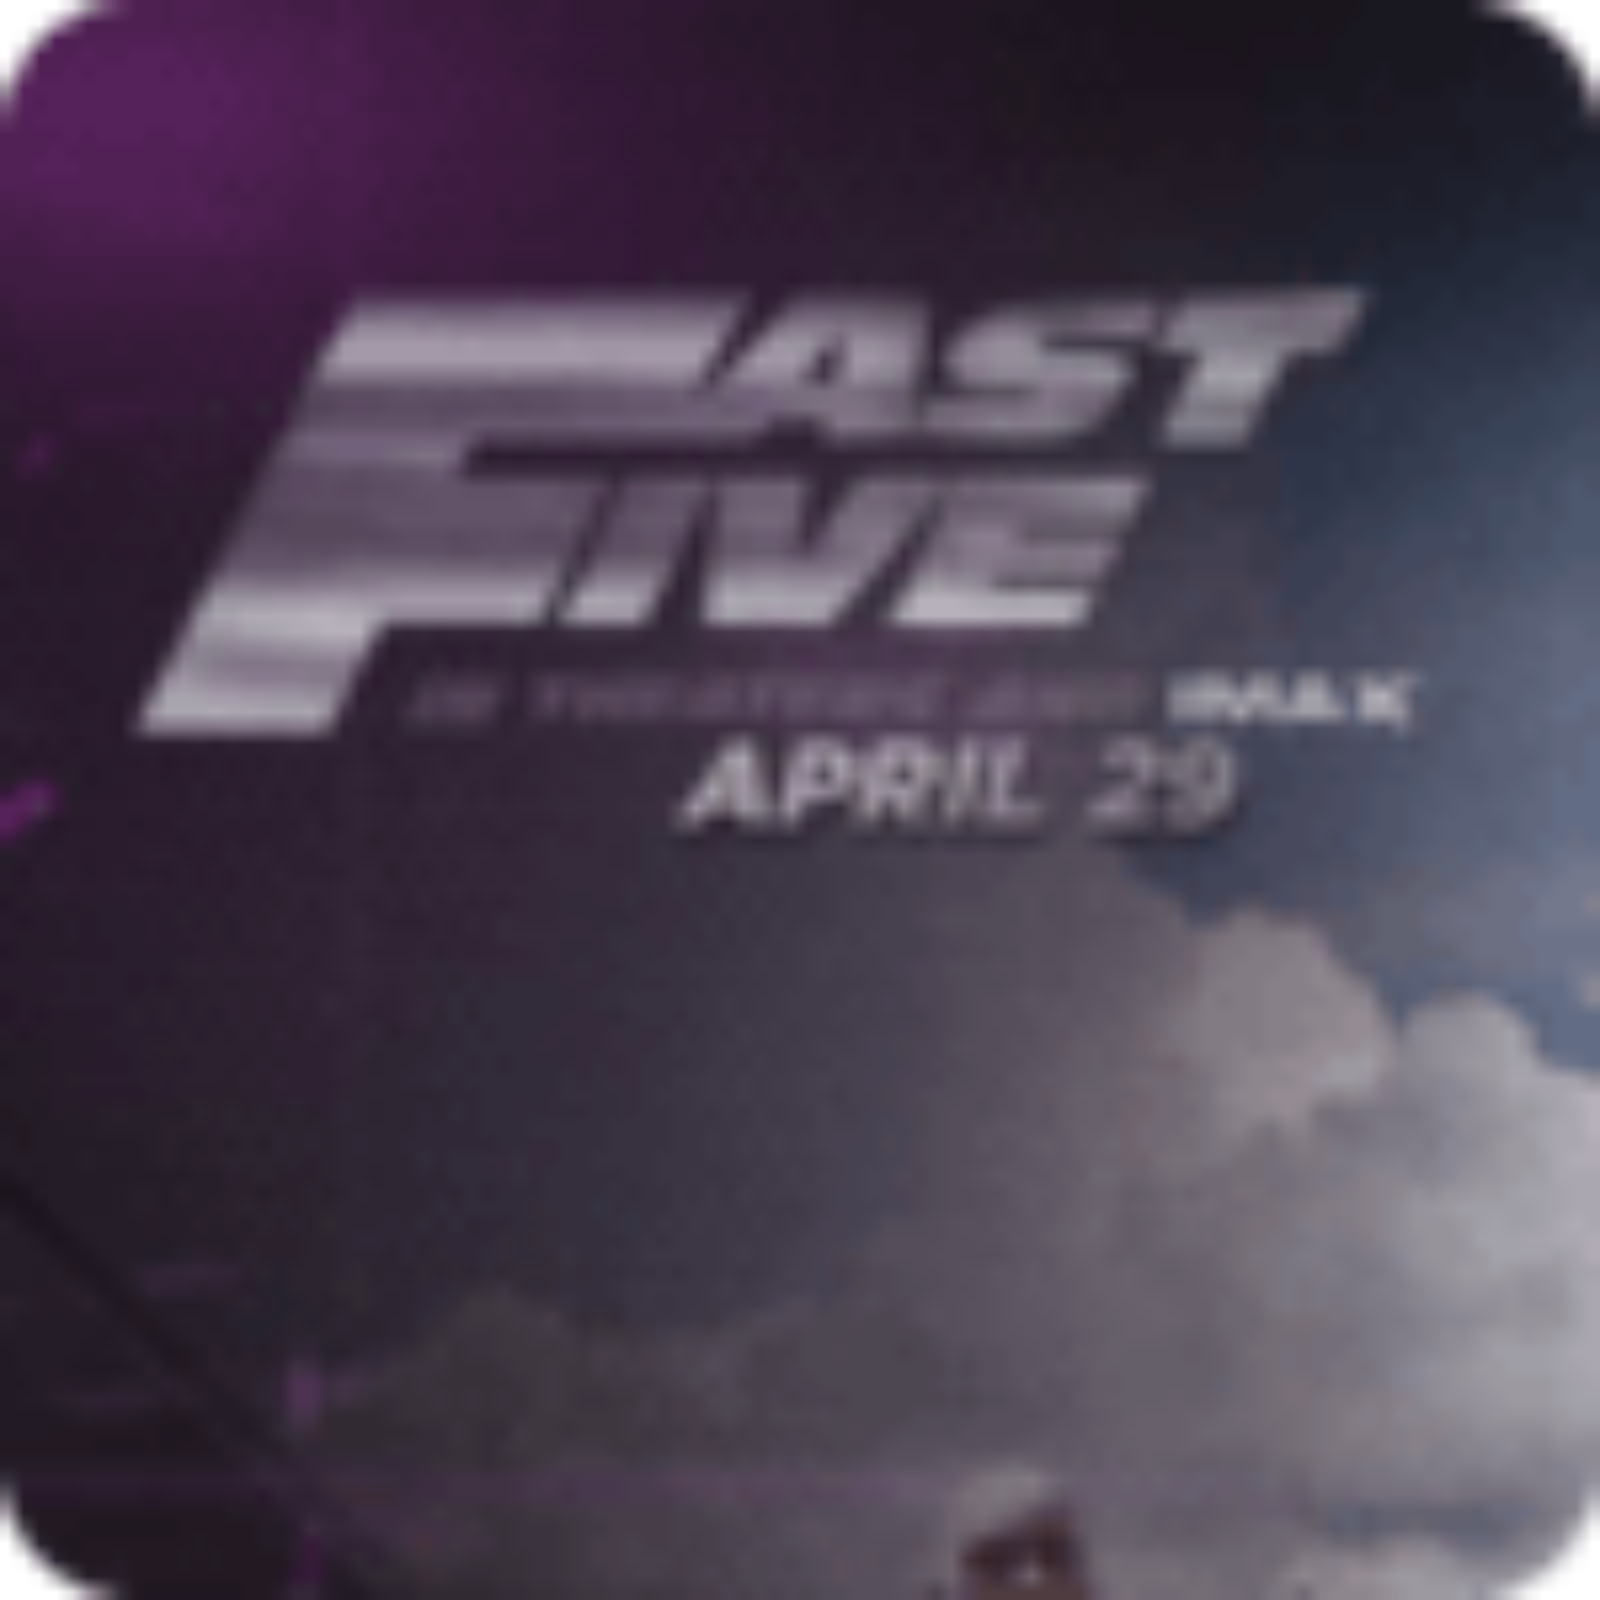 Fast Five Wallpaper